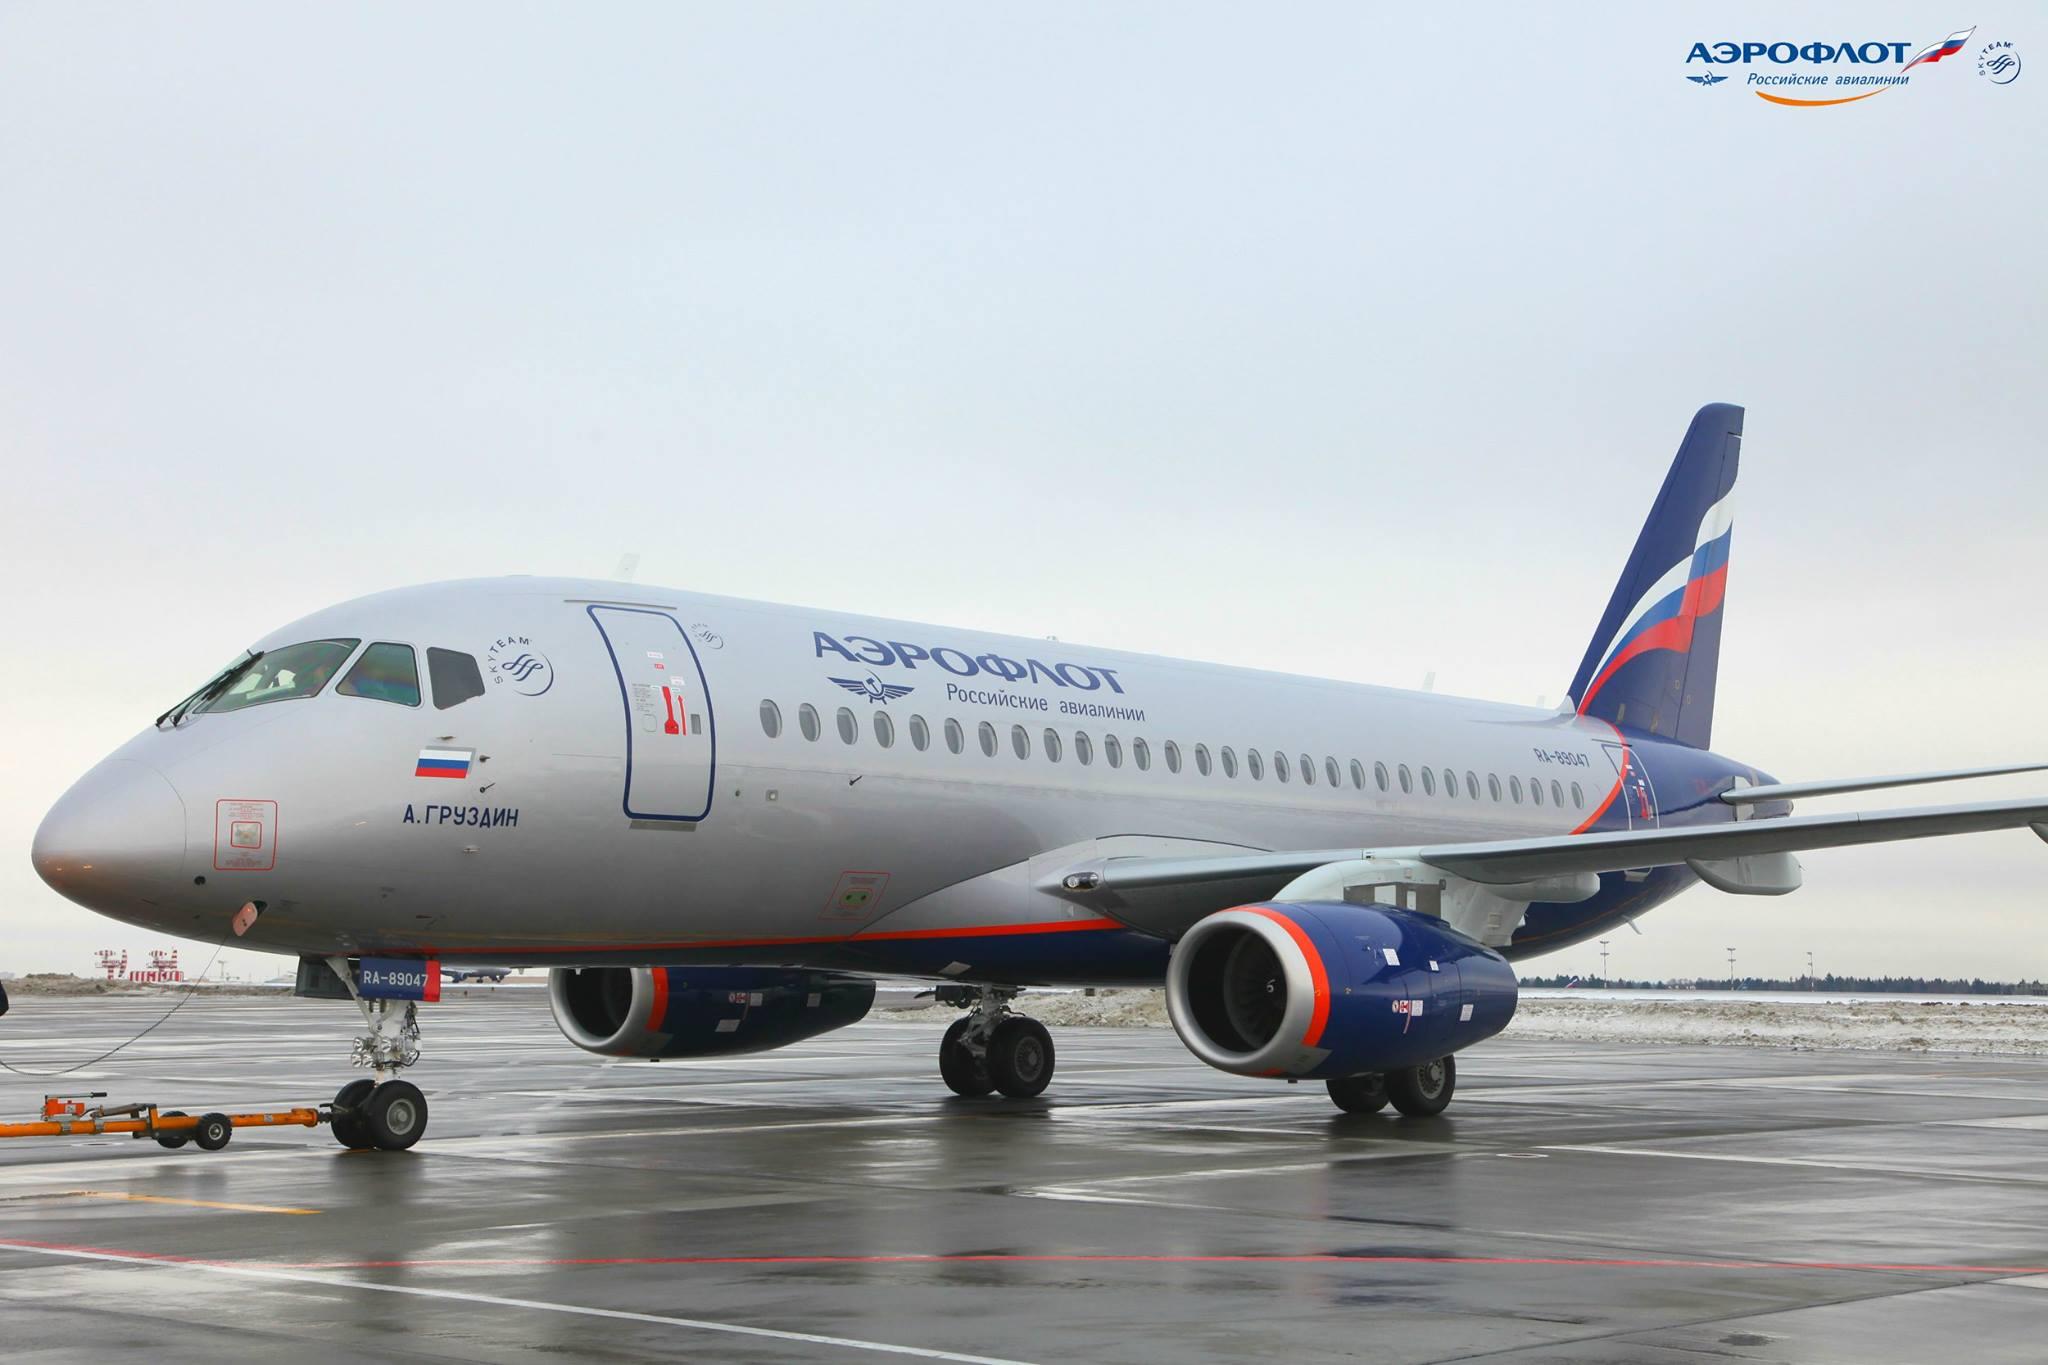 Sukhoi Superjet-100 RA-89047 (95084)